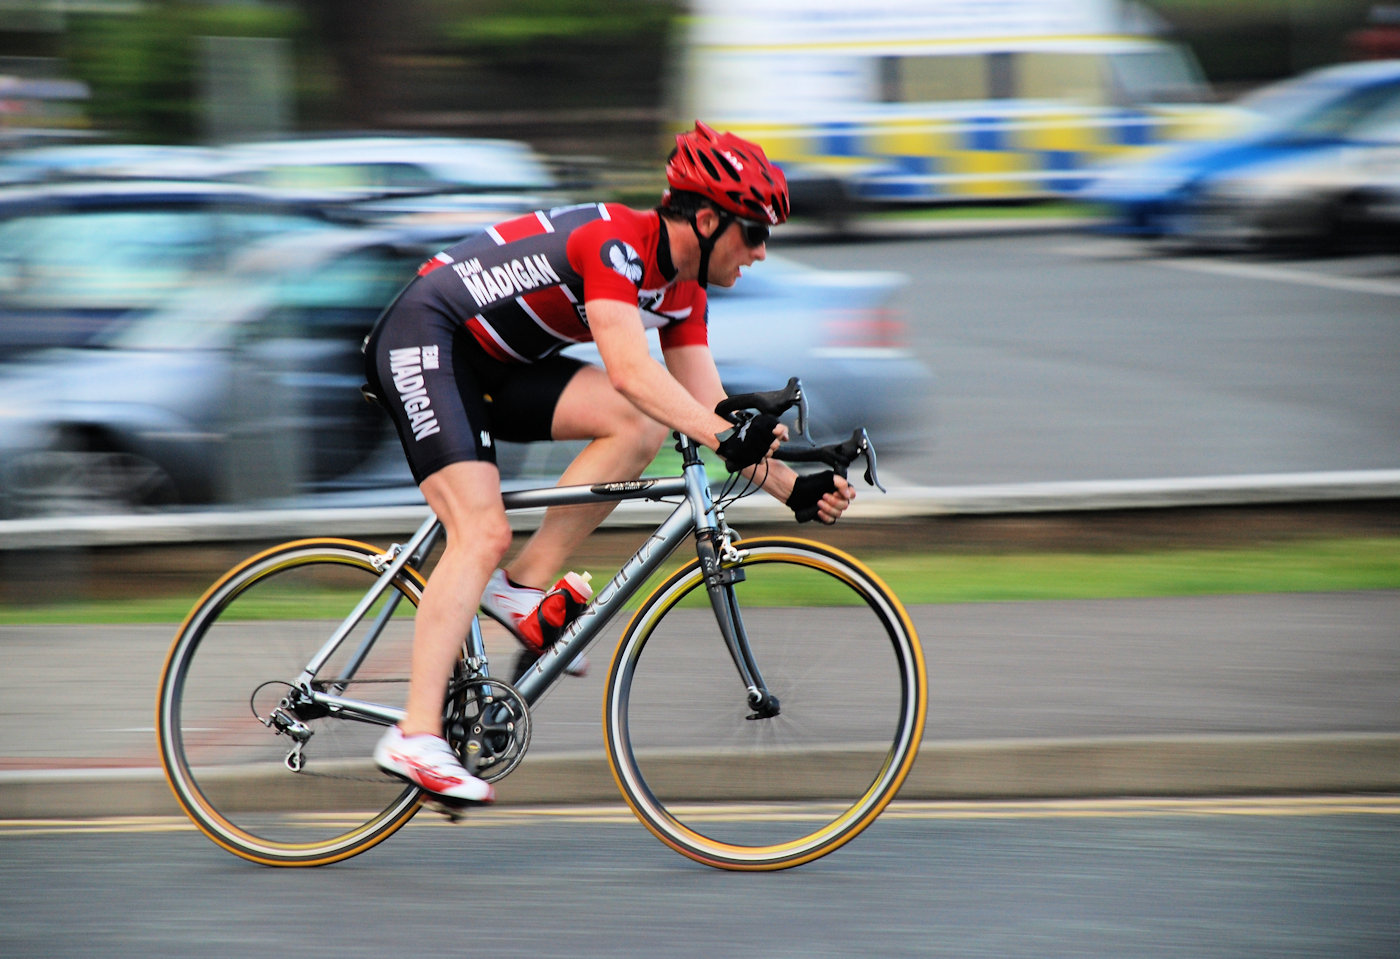 Bike racing in  Carrick-Jun07-11